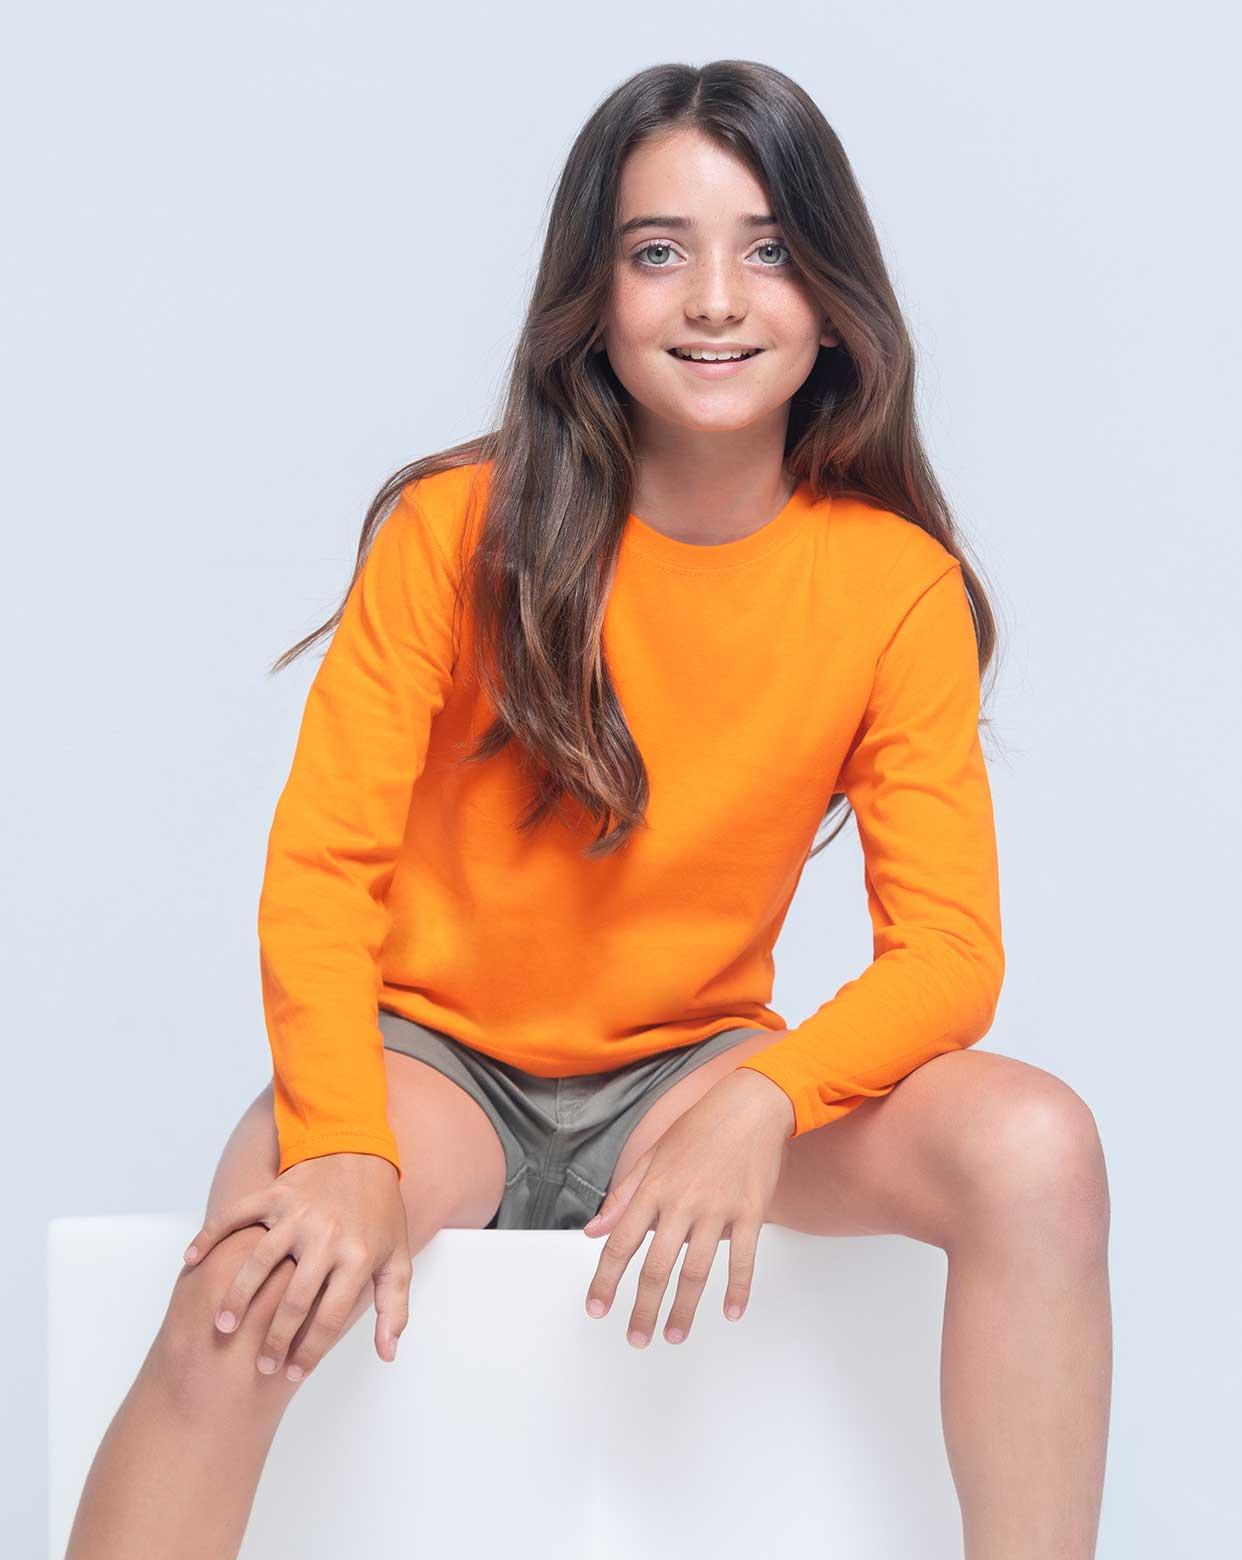 Ever Shine ropa personalizada - Camisetas personalizadas, Mascarillas personalizadas